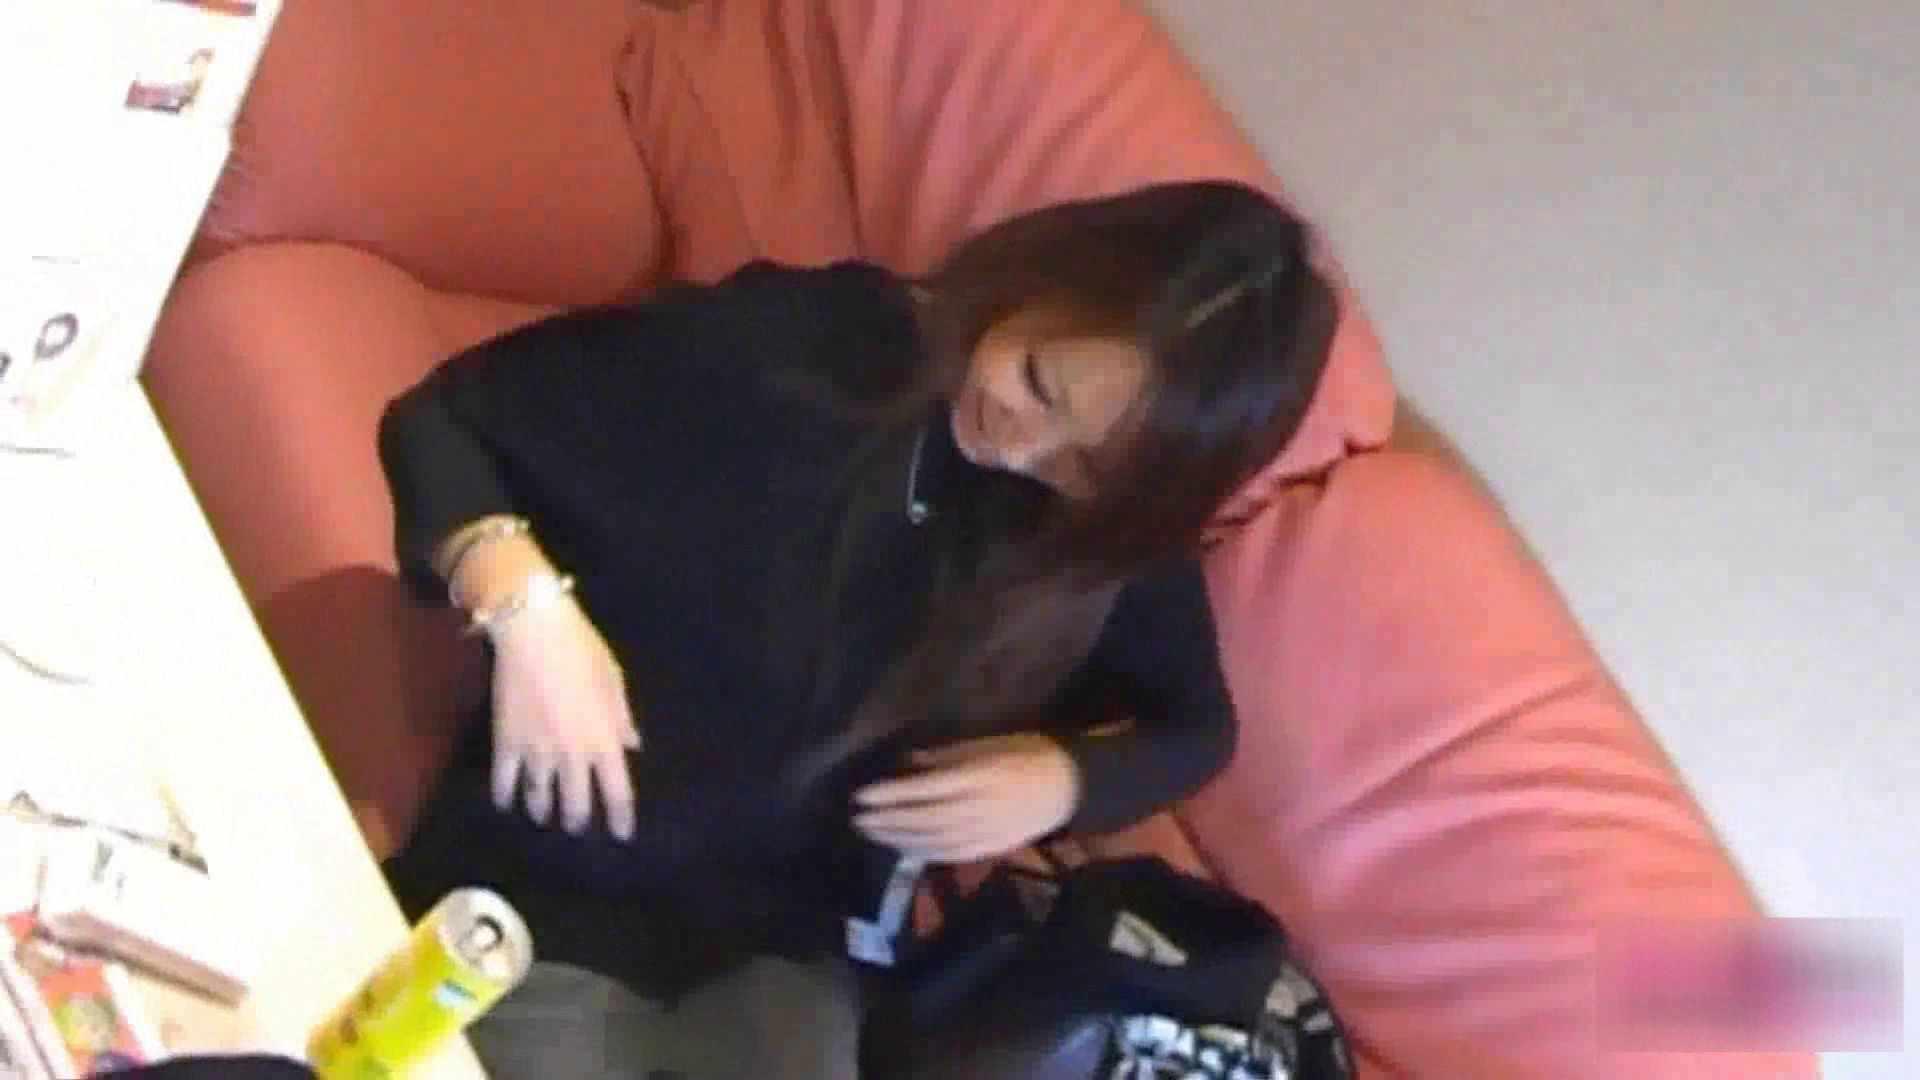 S級厳選美女ビッチガールVol.06 美女丸裸 盗み撮り動画キャプチャ 104pic 32